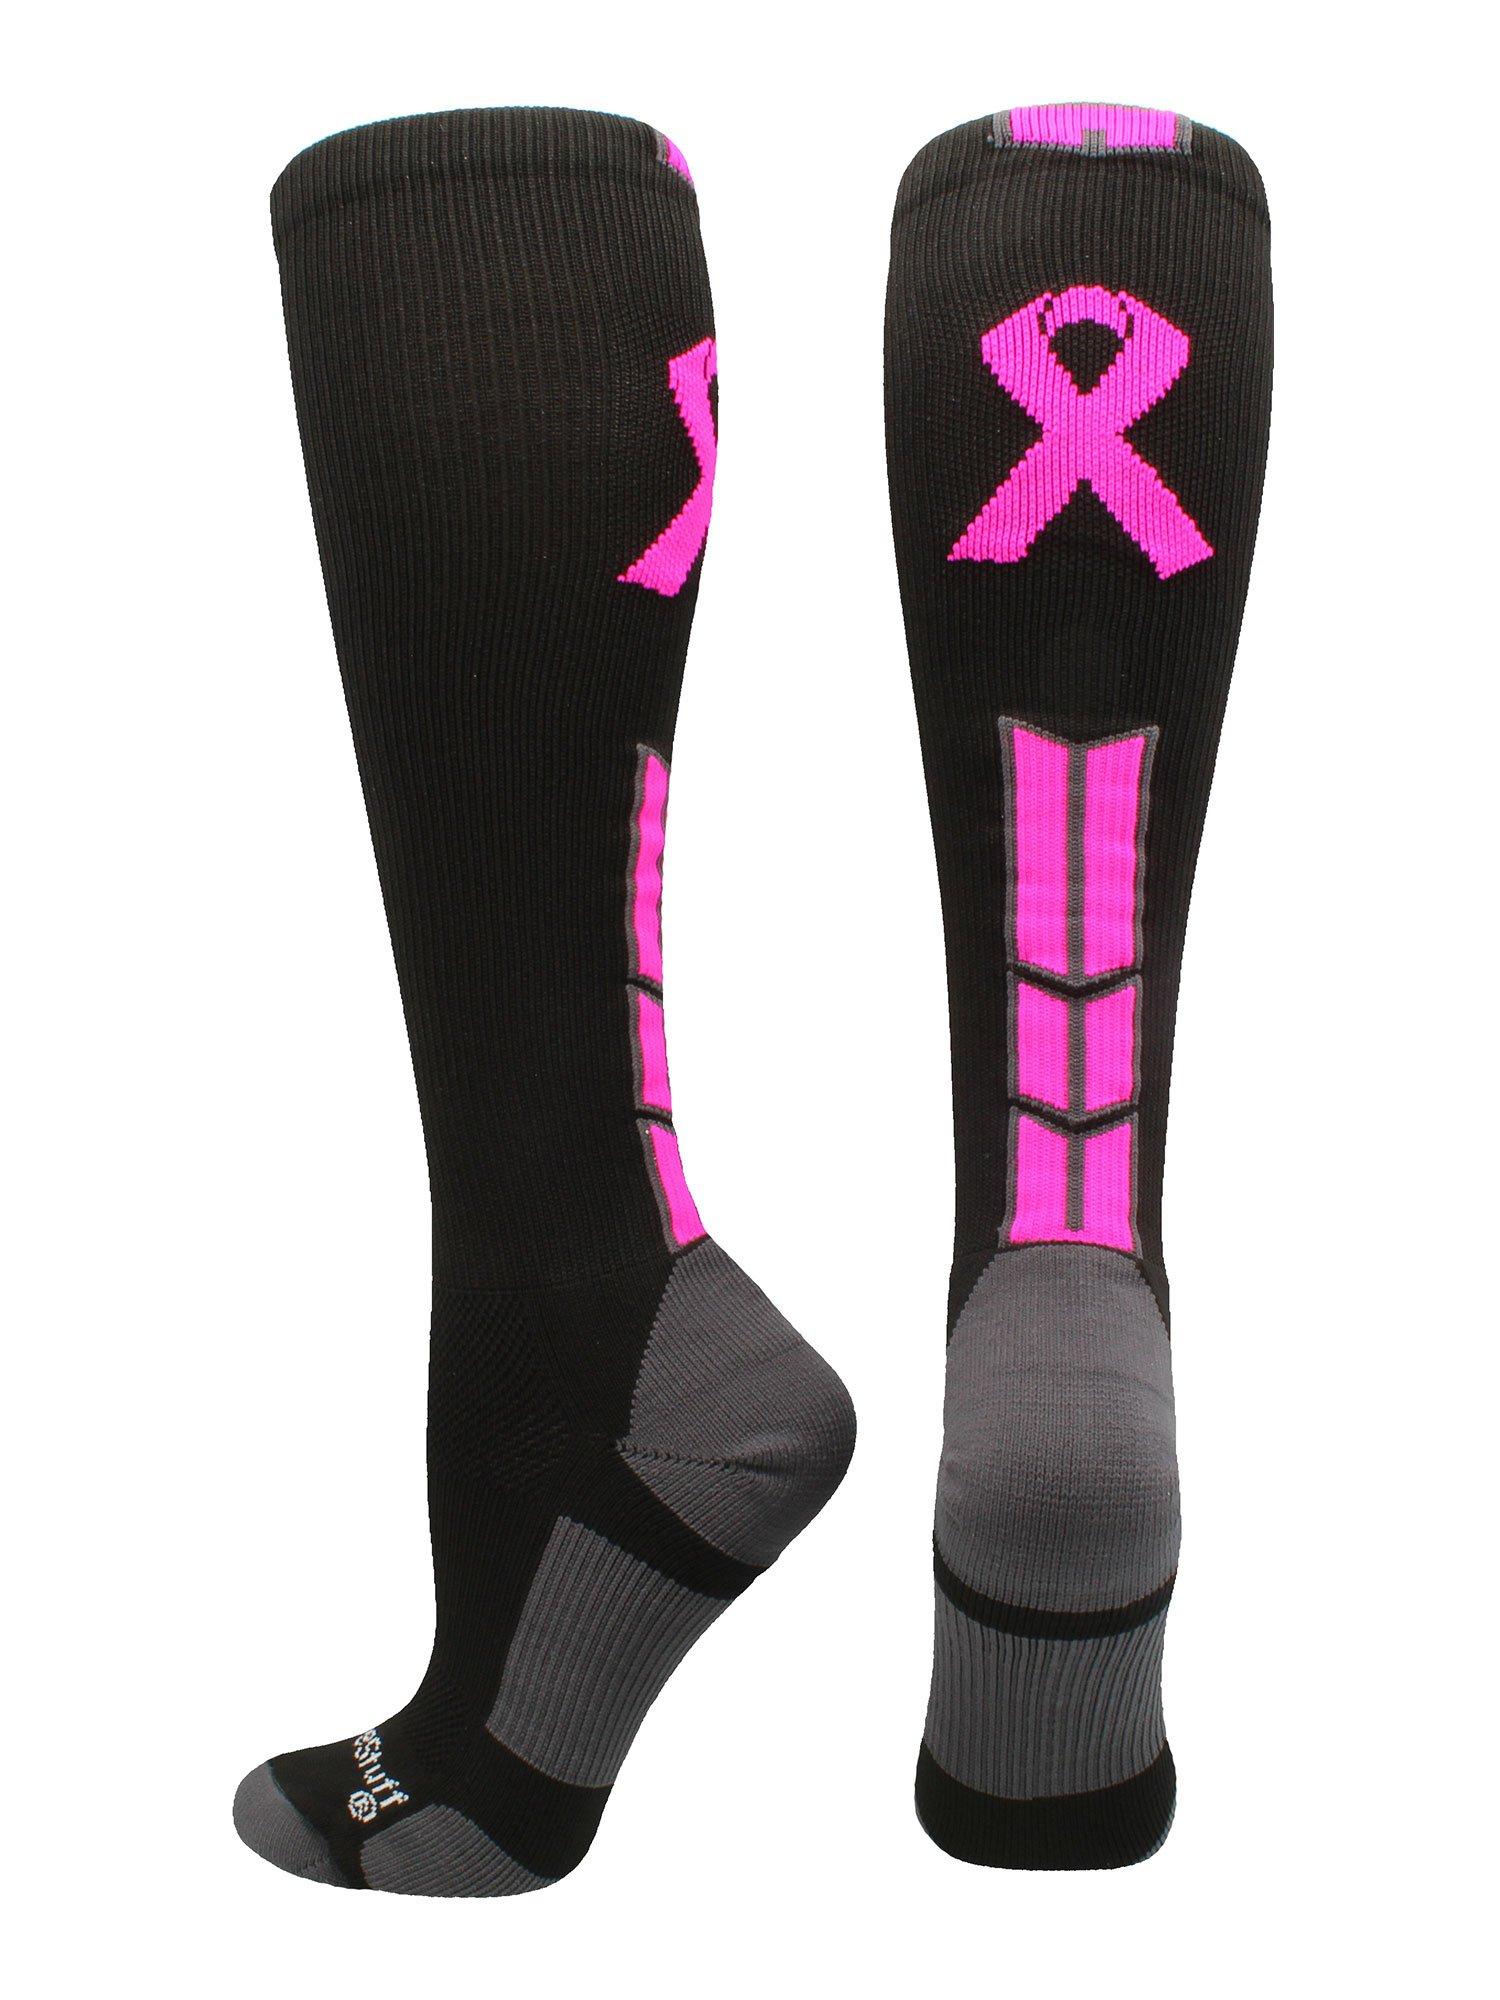 MadSportsStuff Triumph Pink Ribbon Awareness OTC Socks (Black/Neon Pink, Large)